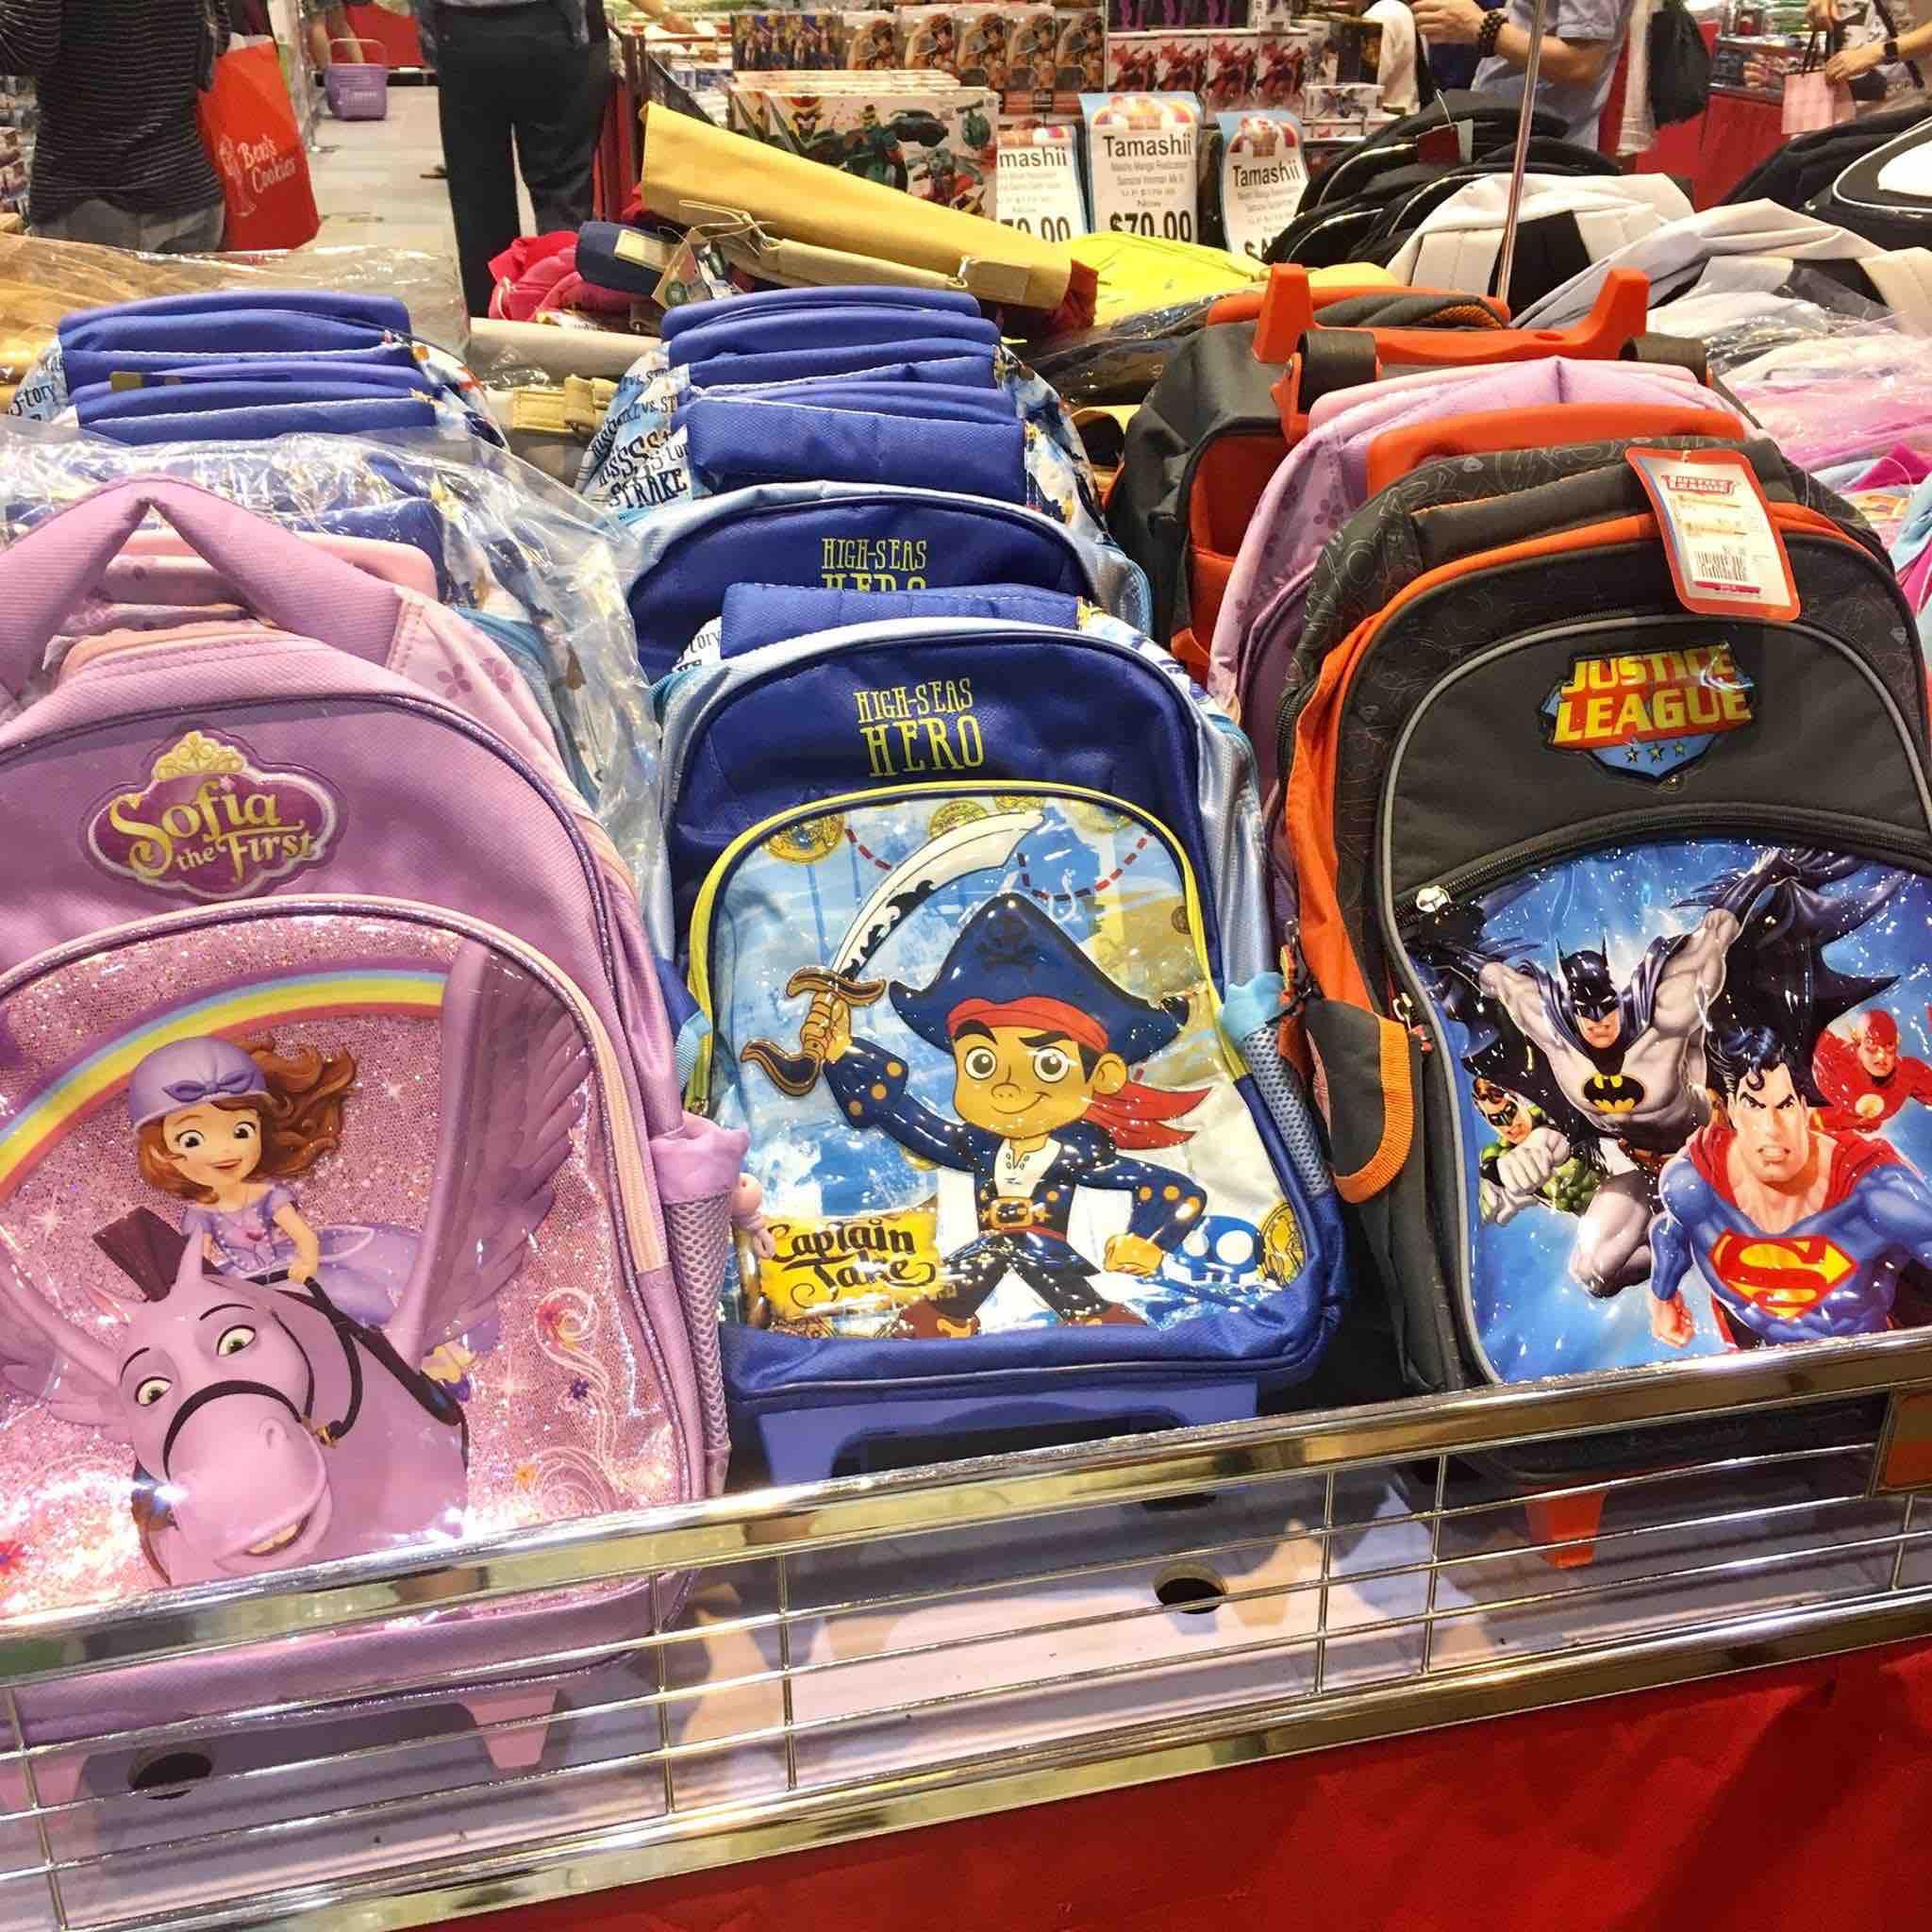 Takashimaya Singapore 21st Craziest Toys Sale Promotion 28 Jul - 6 Aug 2017   Why Not Deals 9 & Promotions